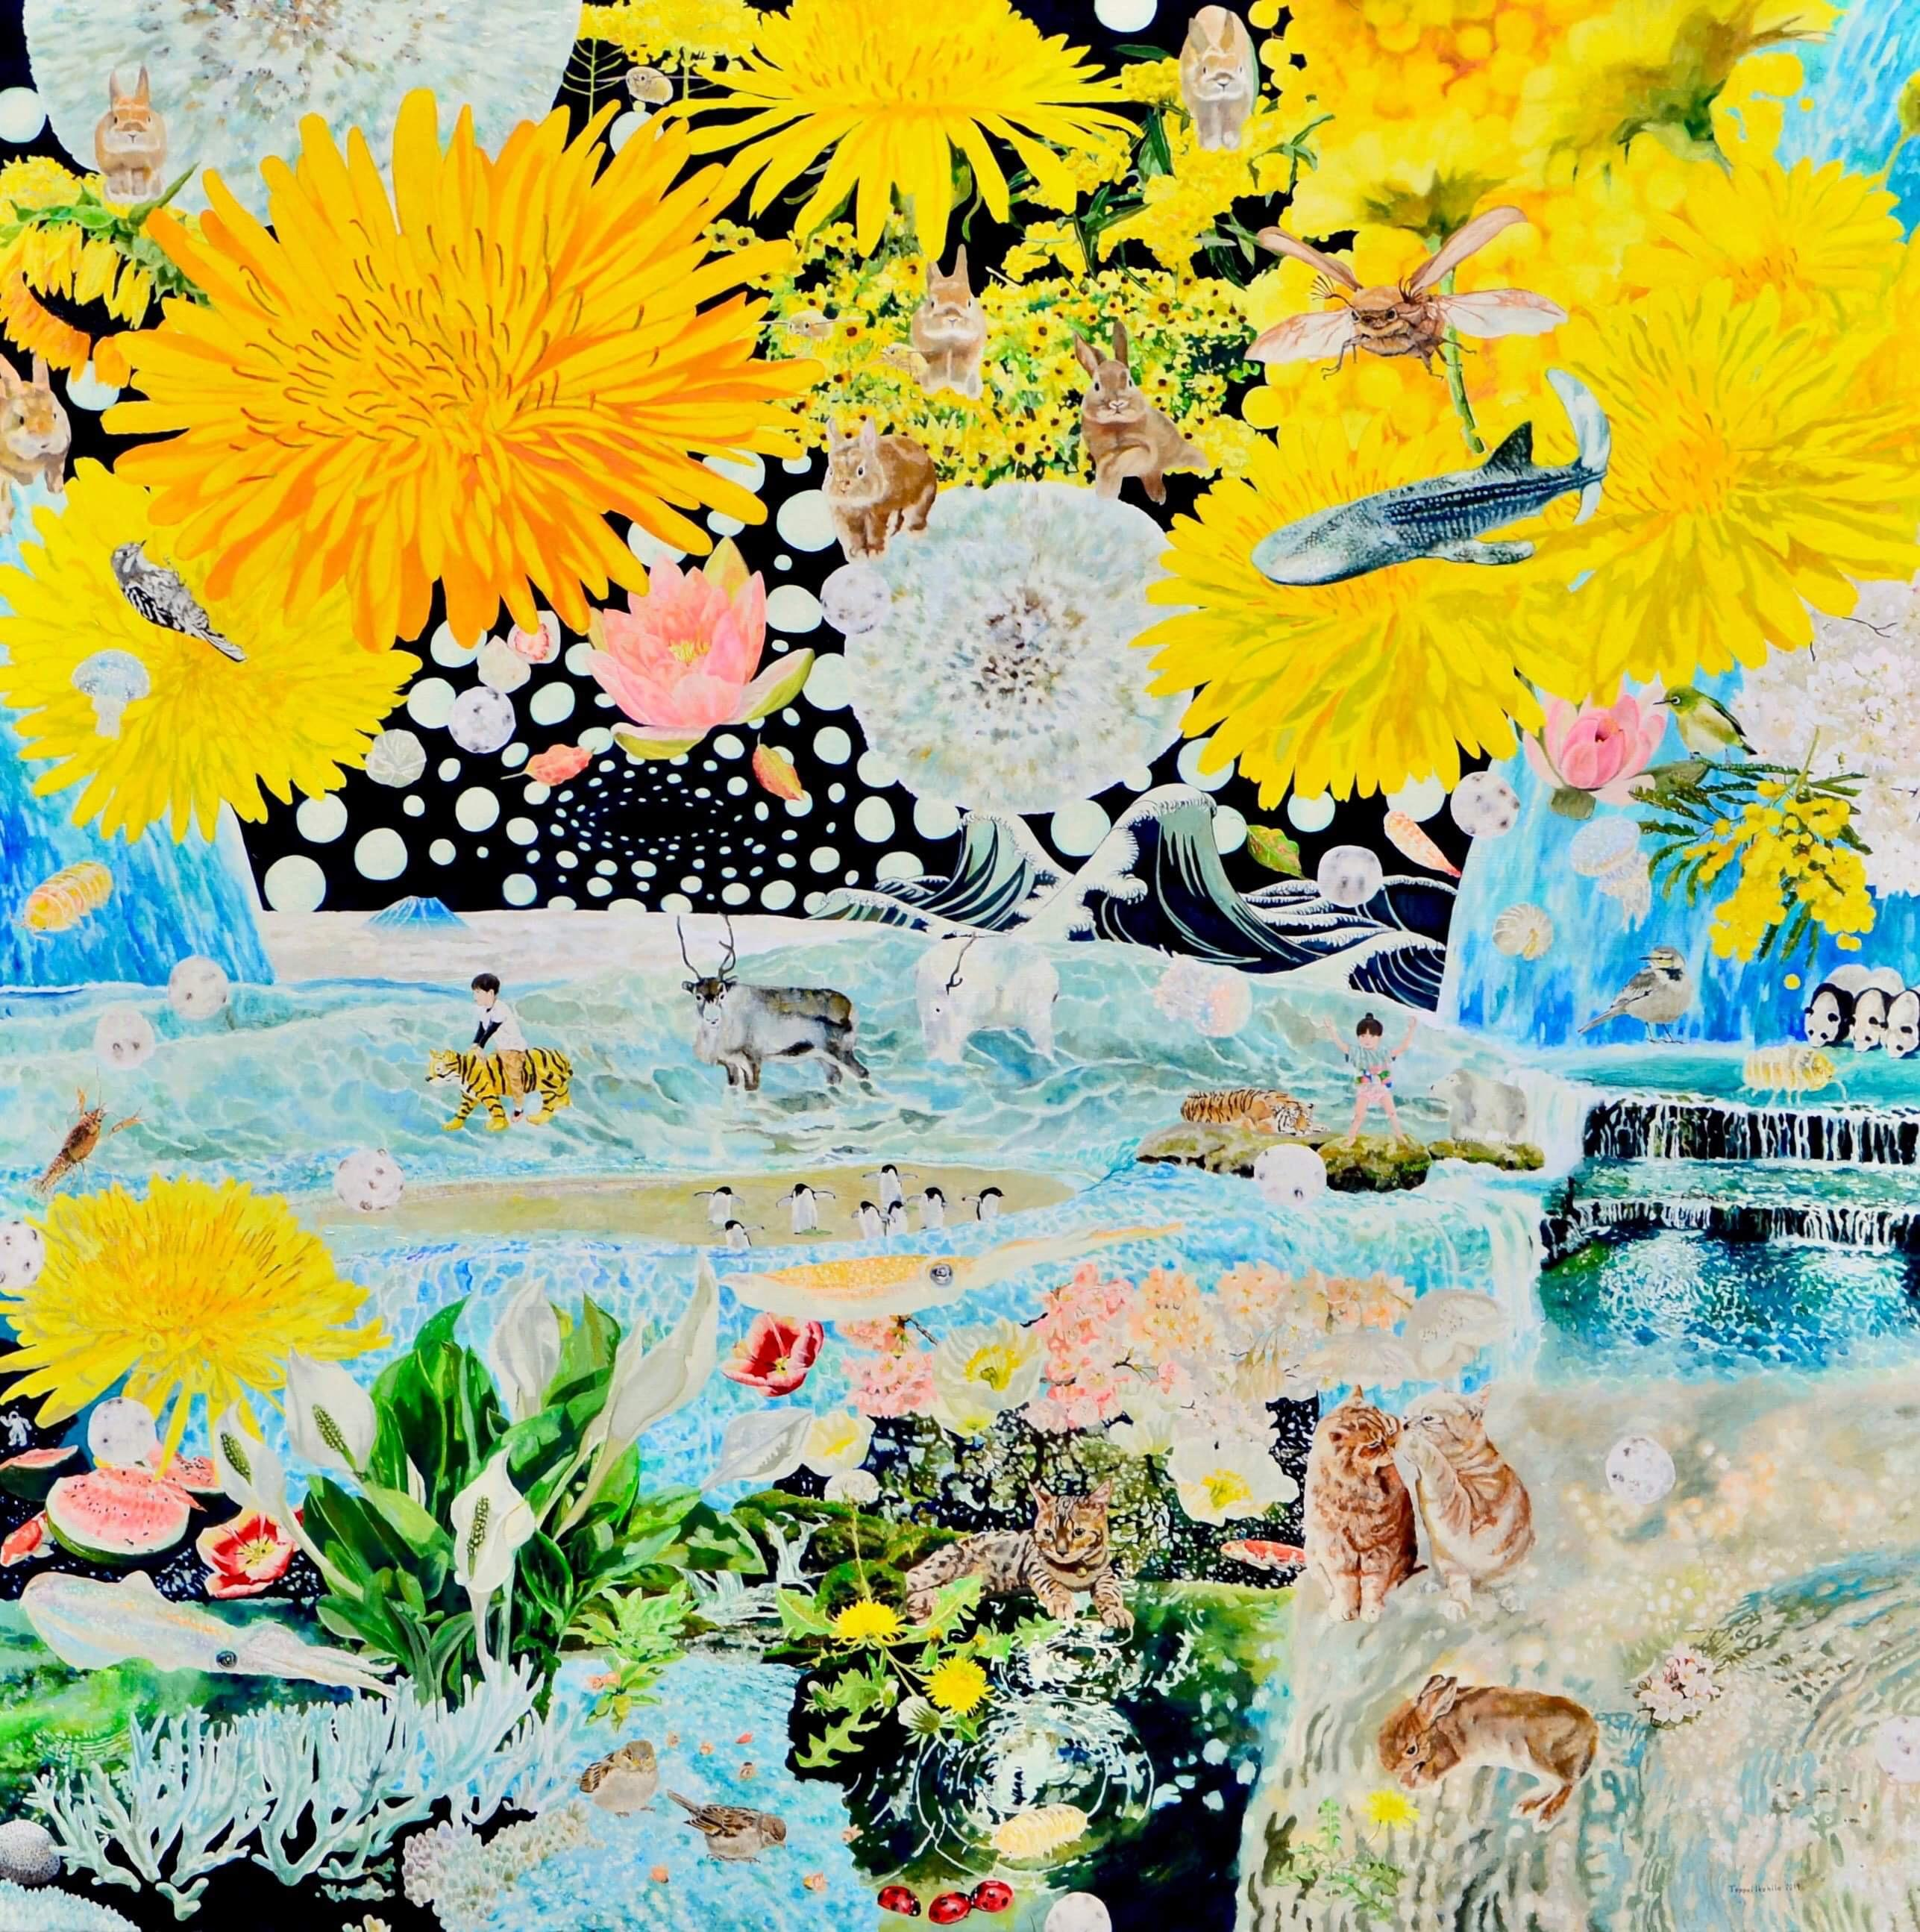 Japanese Contemporary Art by Teppei Ikehila - Outside of Sight Breath